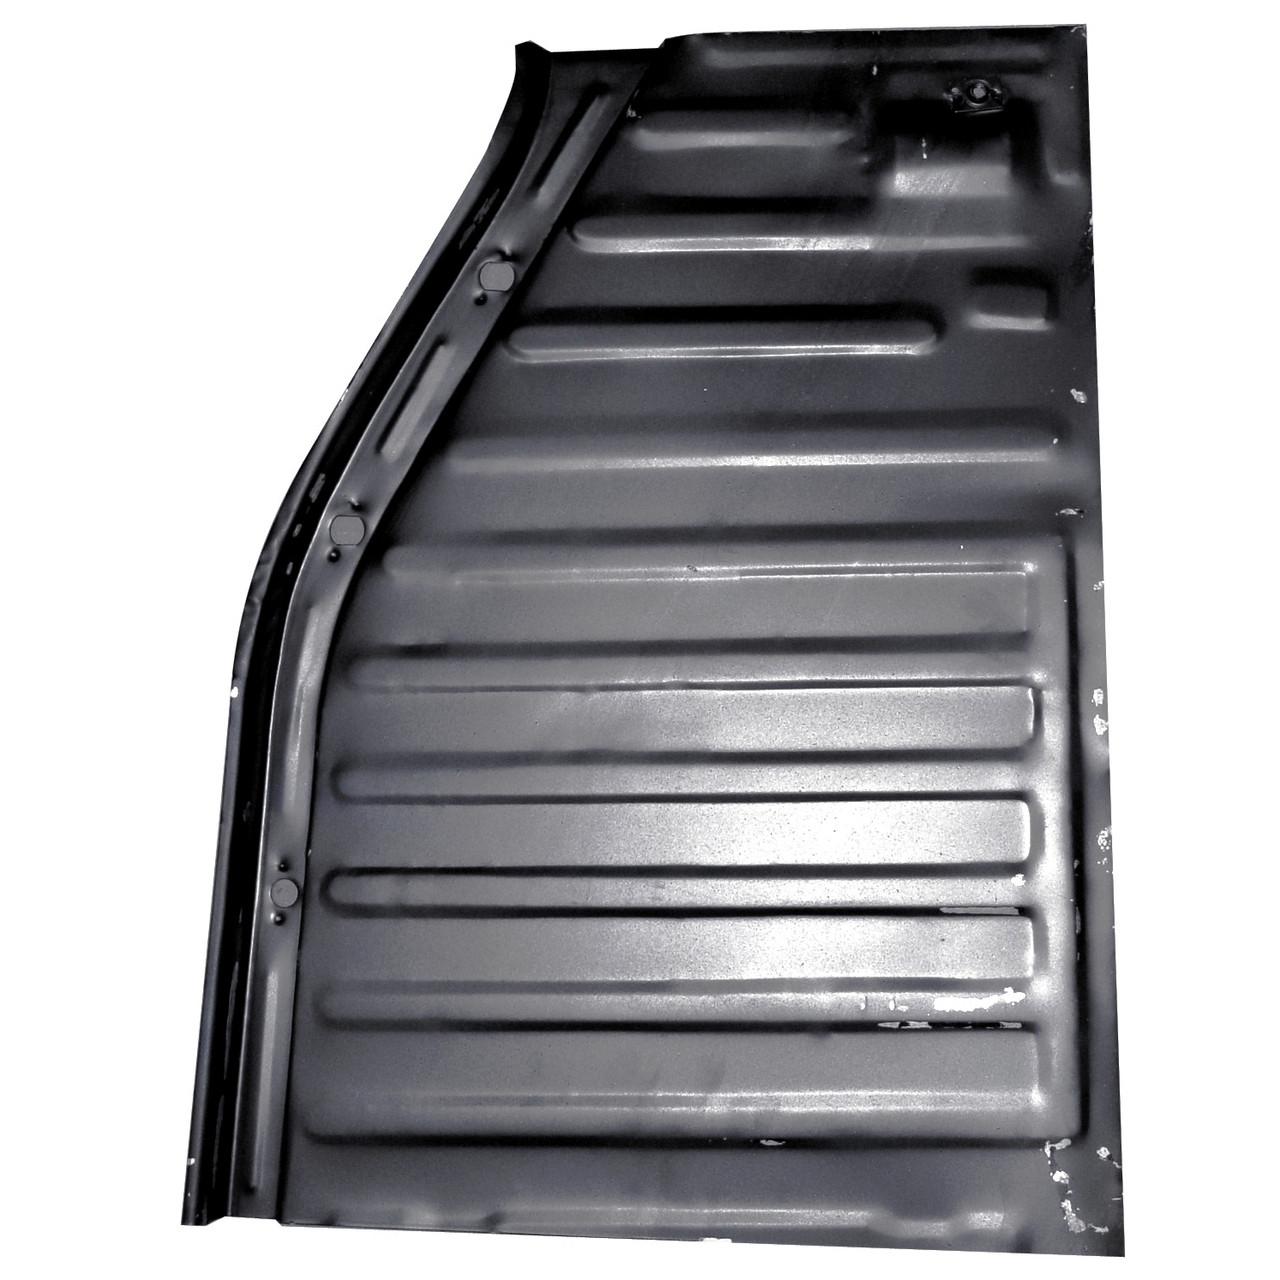 Empi 3550 Vw Bug Driver Side Front Floor Pan, Welding